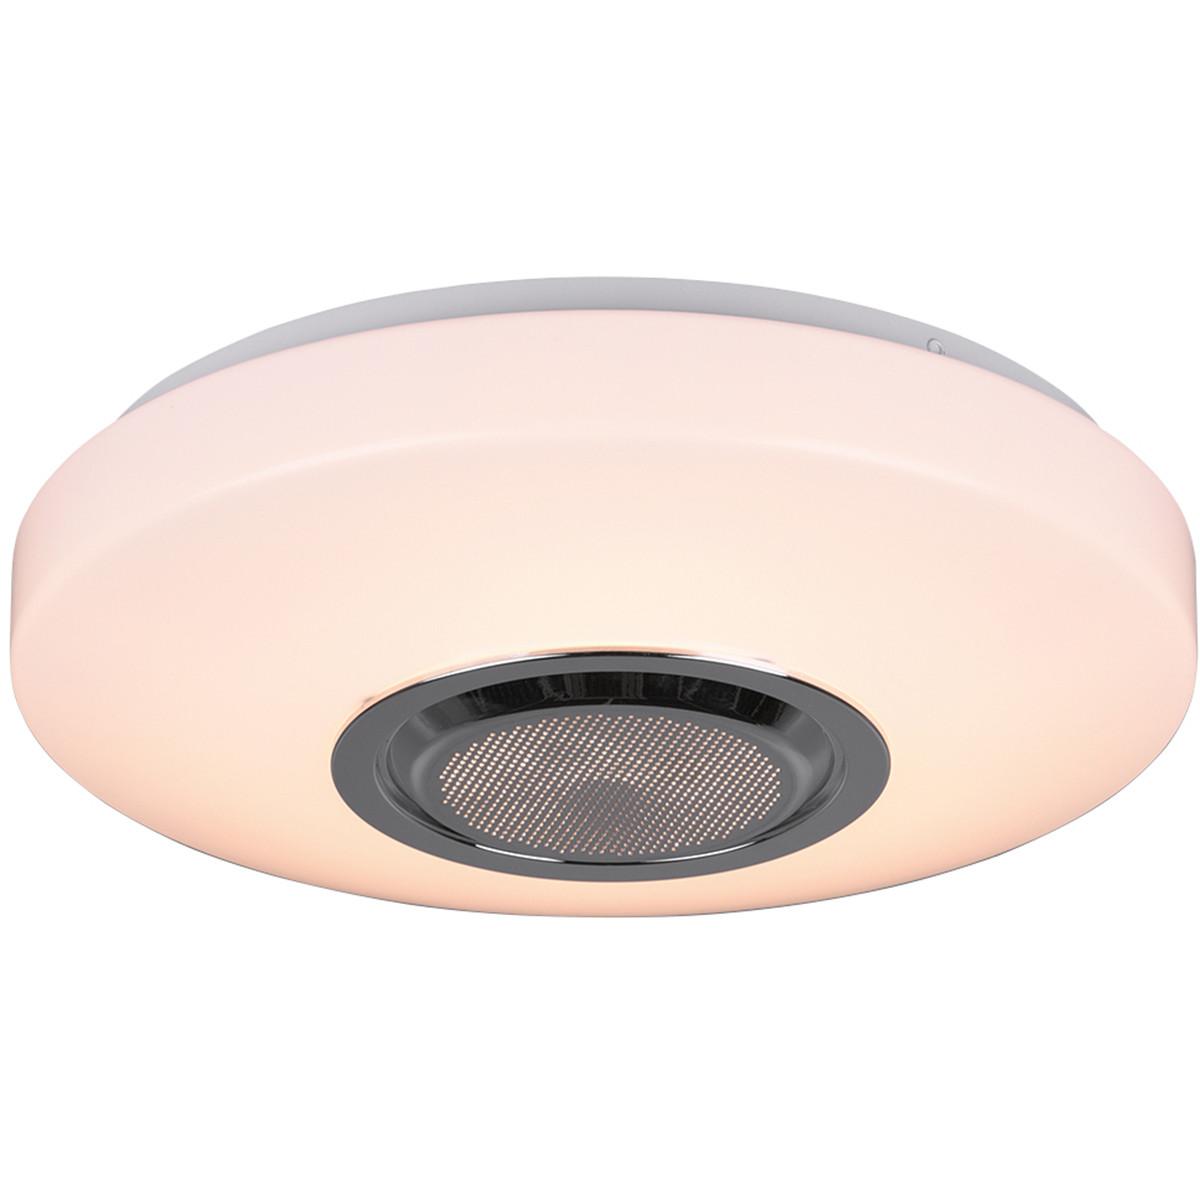 LED Plafondlamp - Trion Niamy - 10W - Bluetooth Luidspreker - RGBW - Dimbaar - Afstandsbediening - R